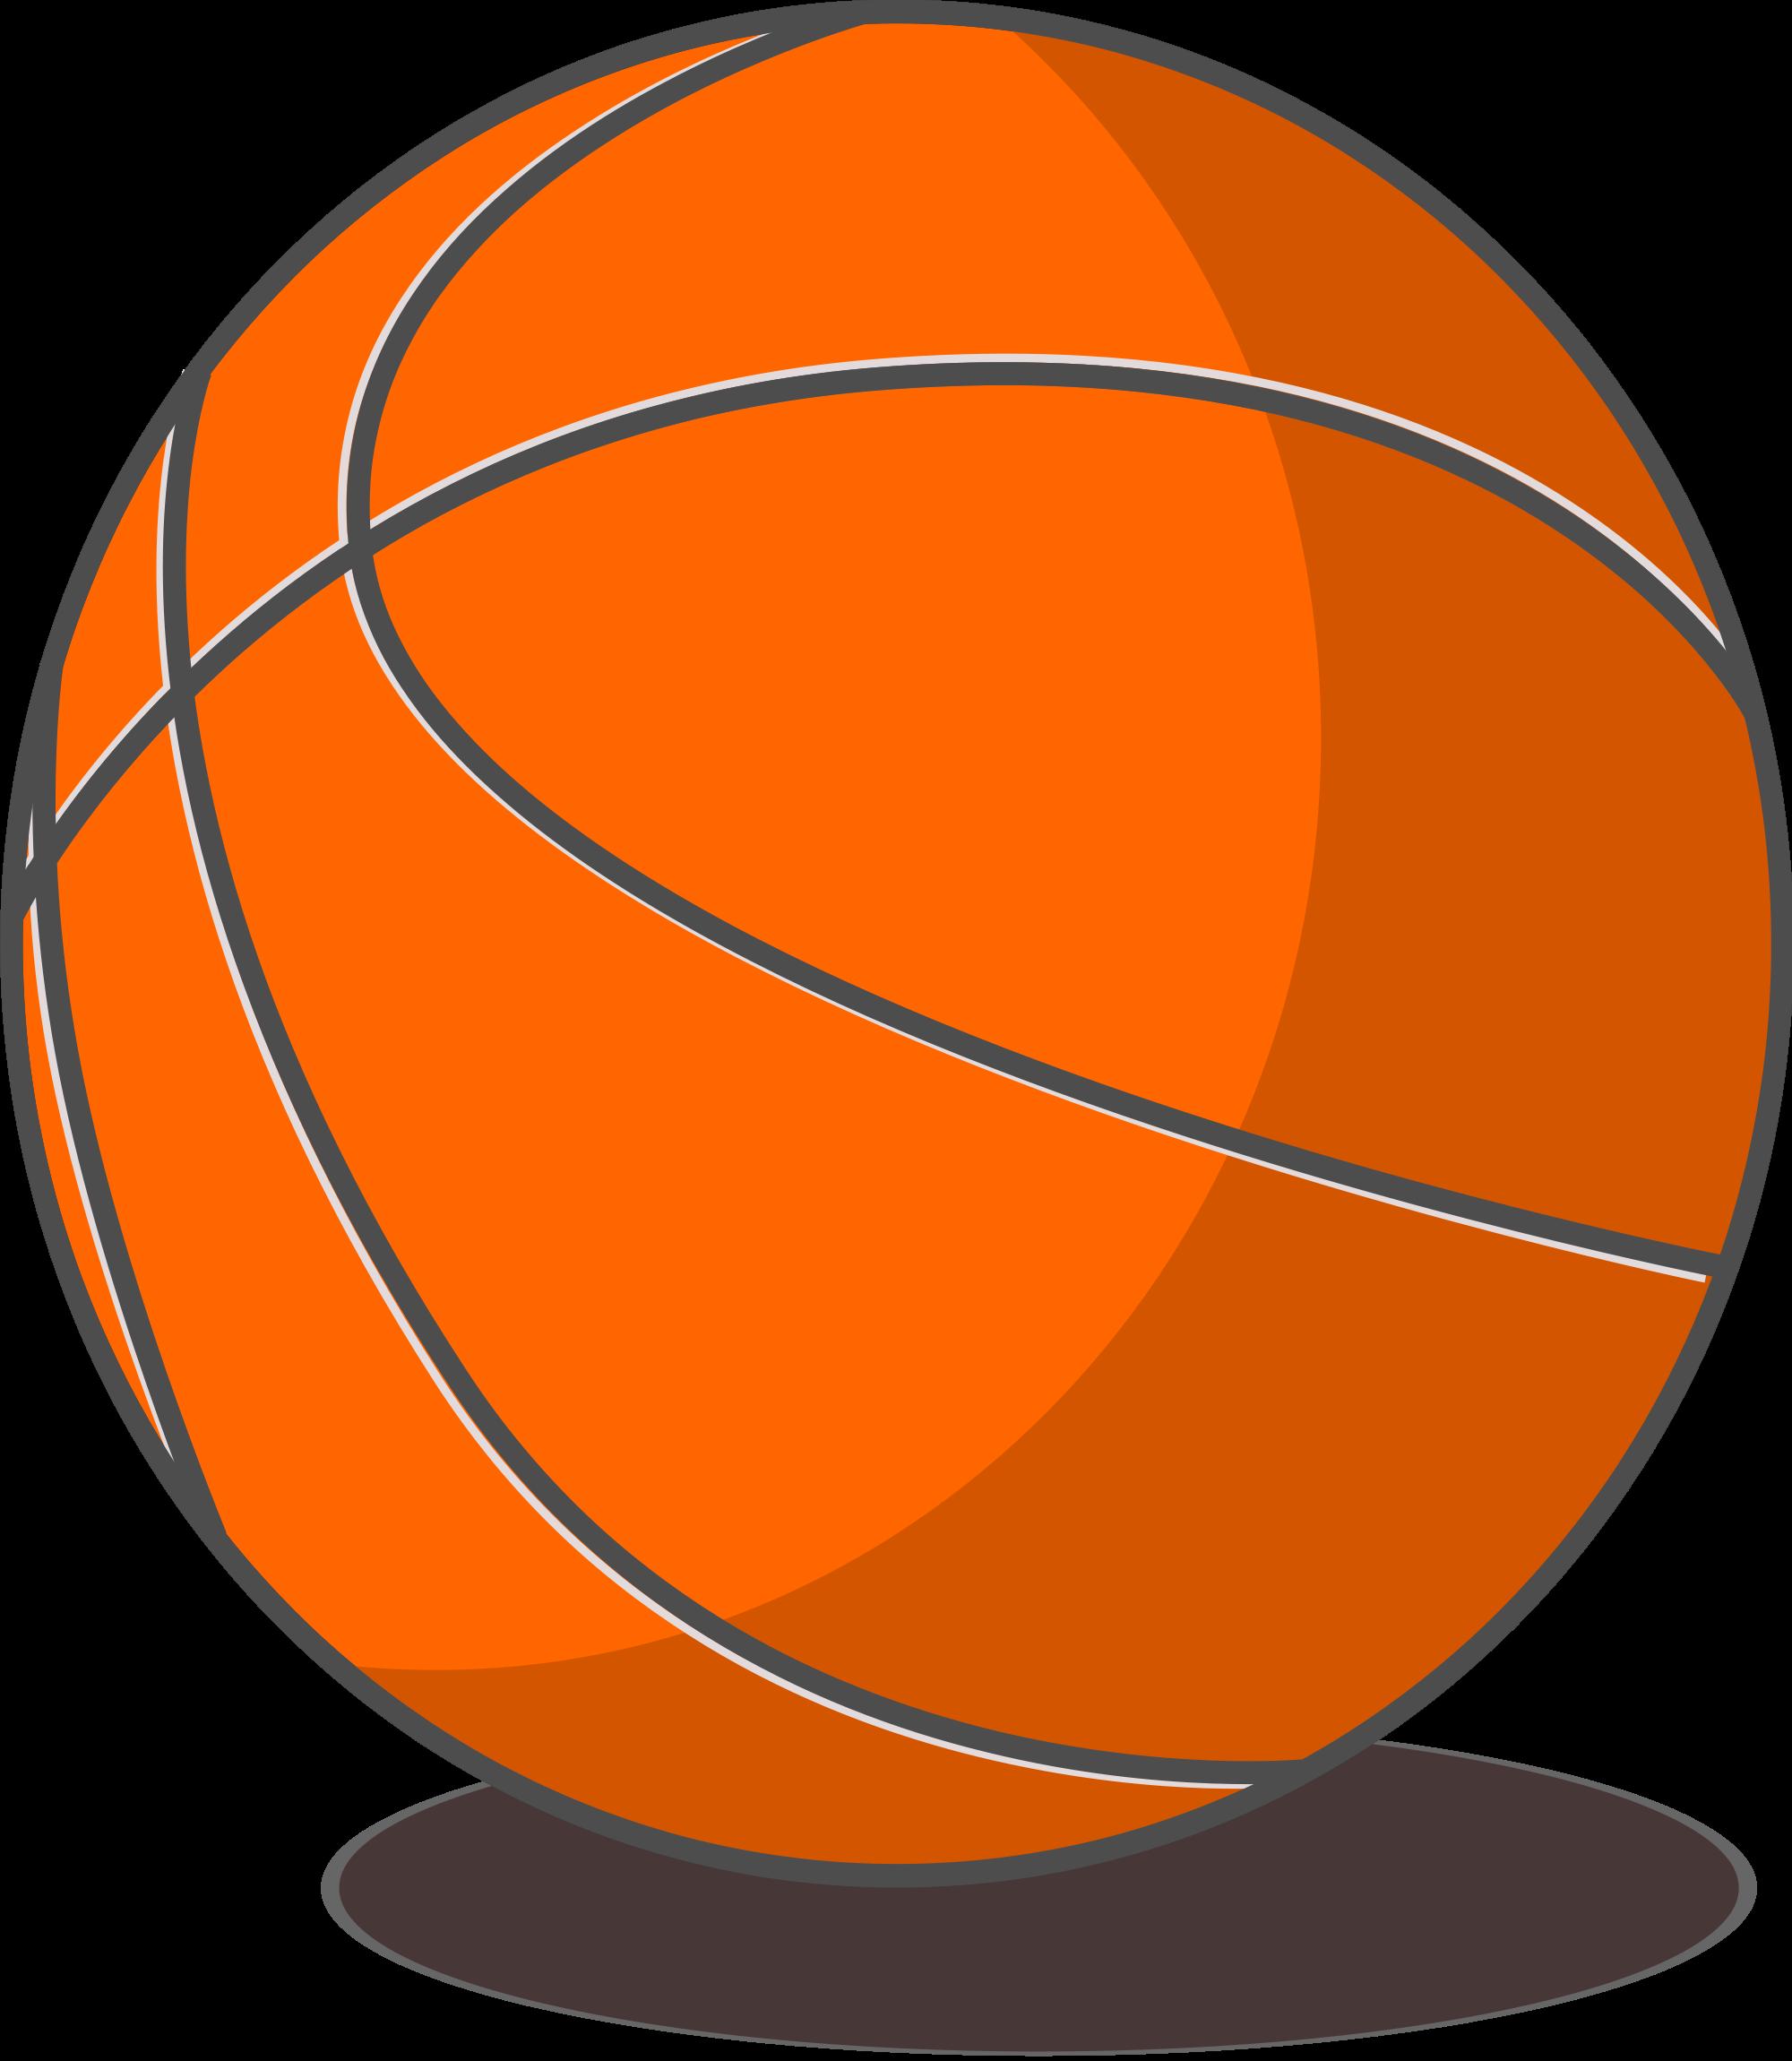 2000x2300 Filebasketball.svg